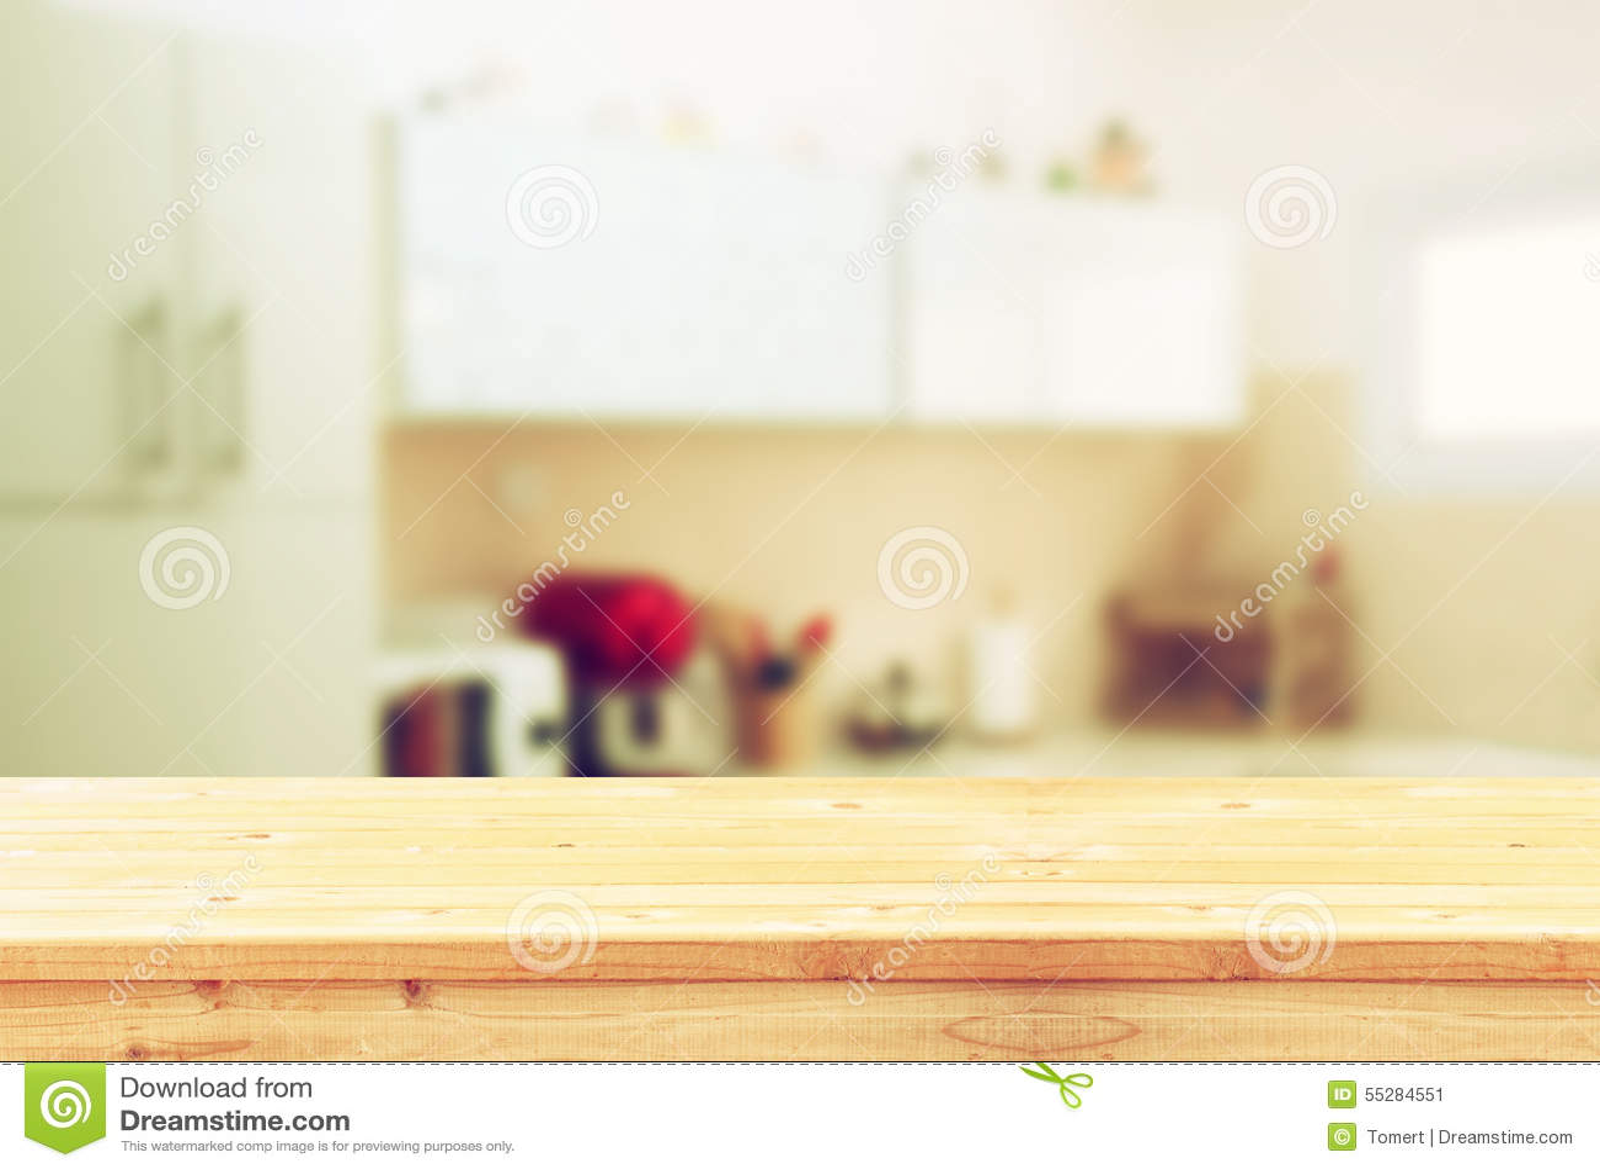 Vintage Kitchen Background ~ Empty table board and defocused white retro kitchen